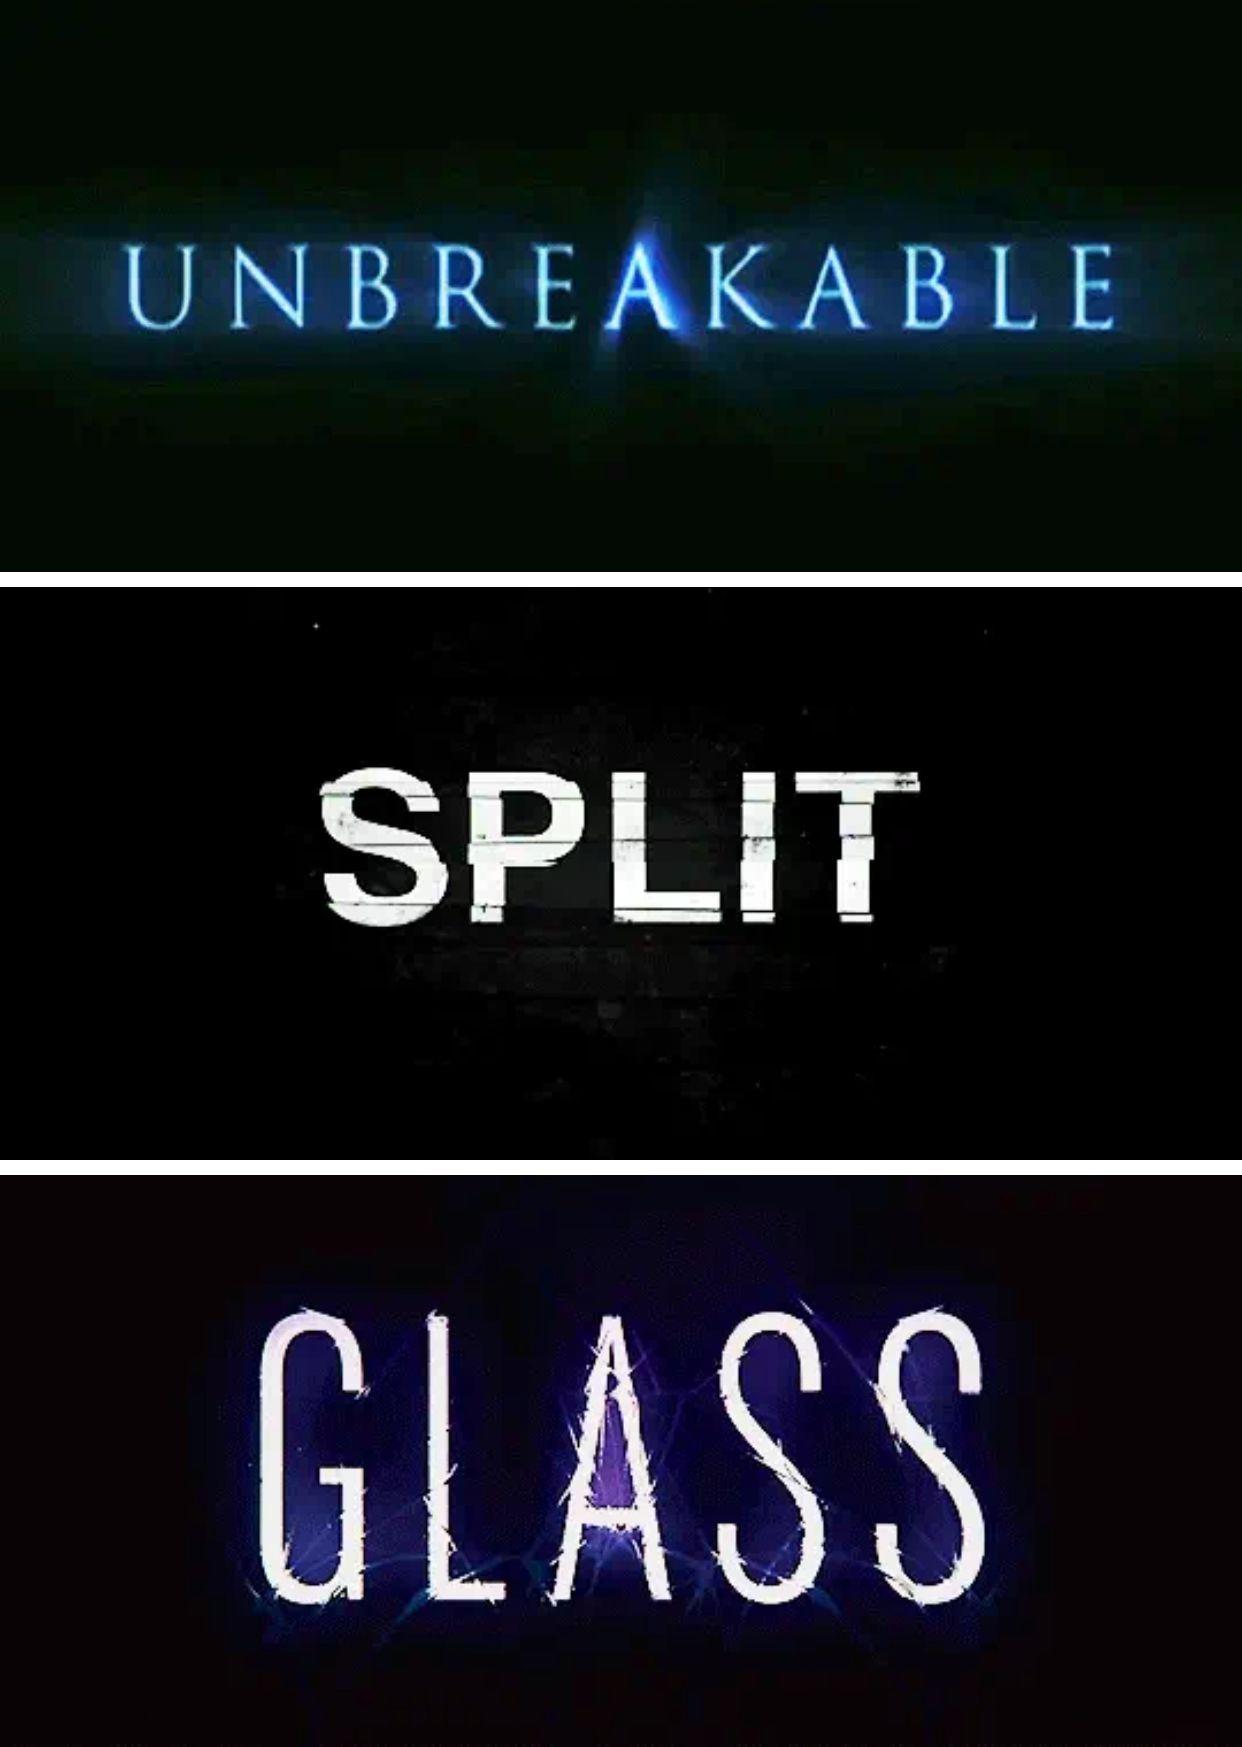 Unbreakable 2000 Split 2016 Glass 2019 Dir M Night Shyamalan Split Movie Comic Movies Unbreakable